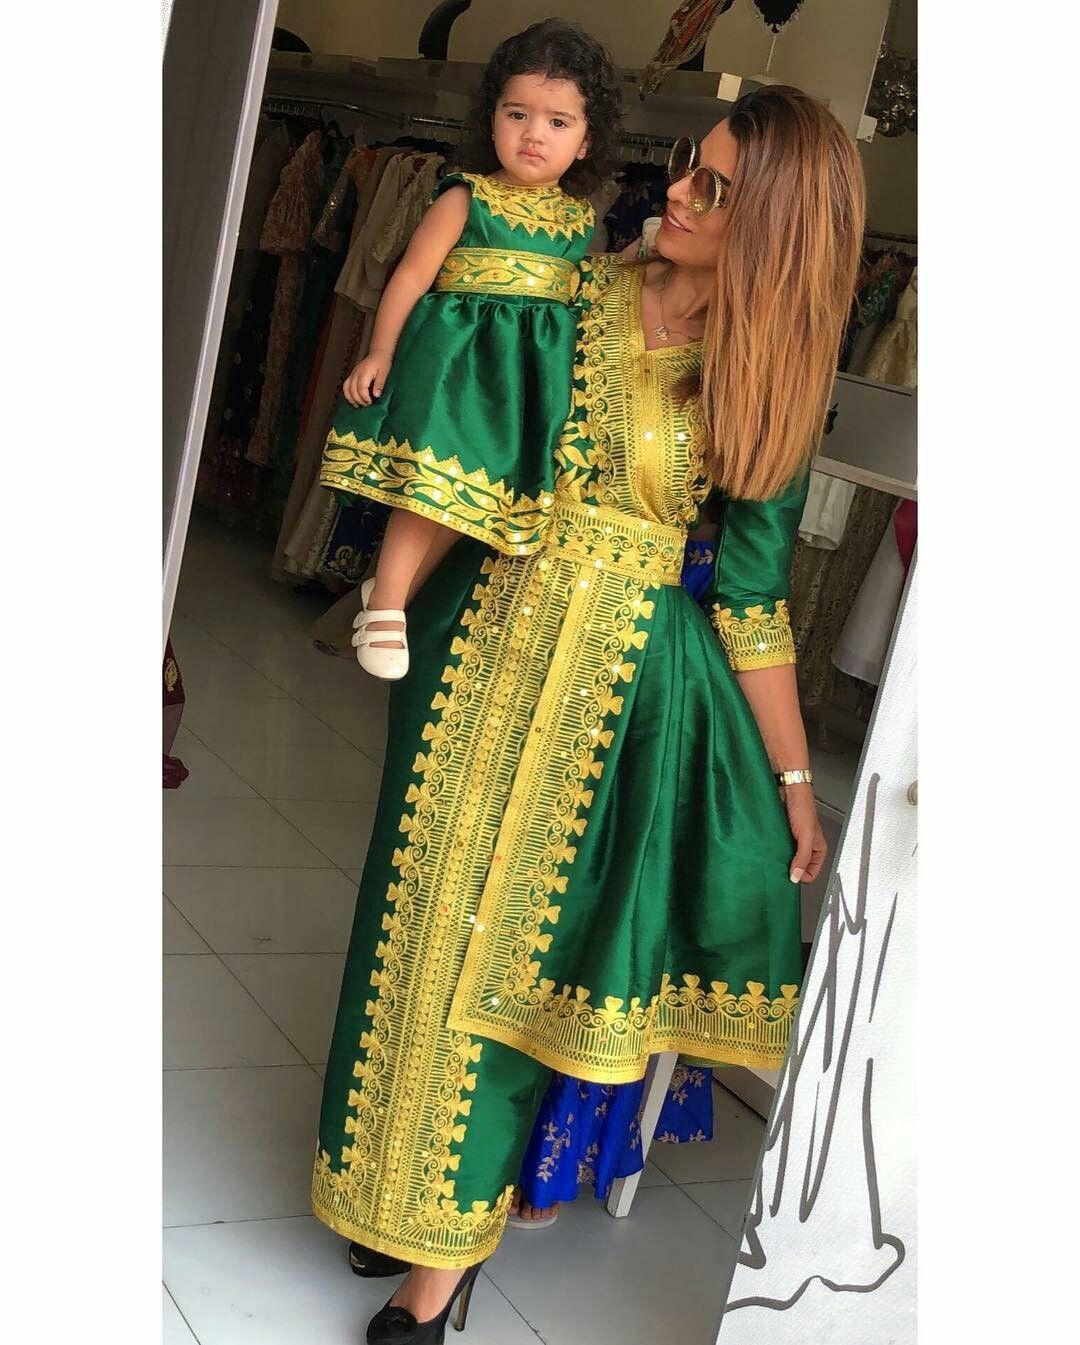 Pin By Besho On موديلات خليجية و عربية Dress Culture Kids Fashion Dress Evening Dress Fashion